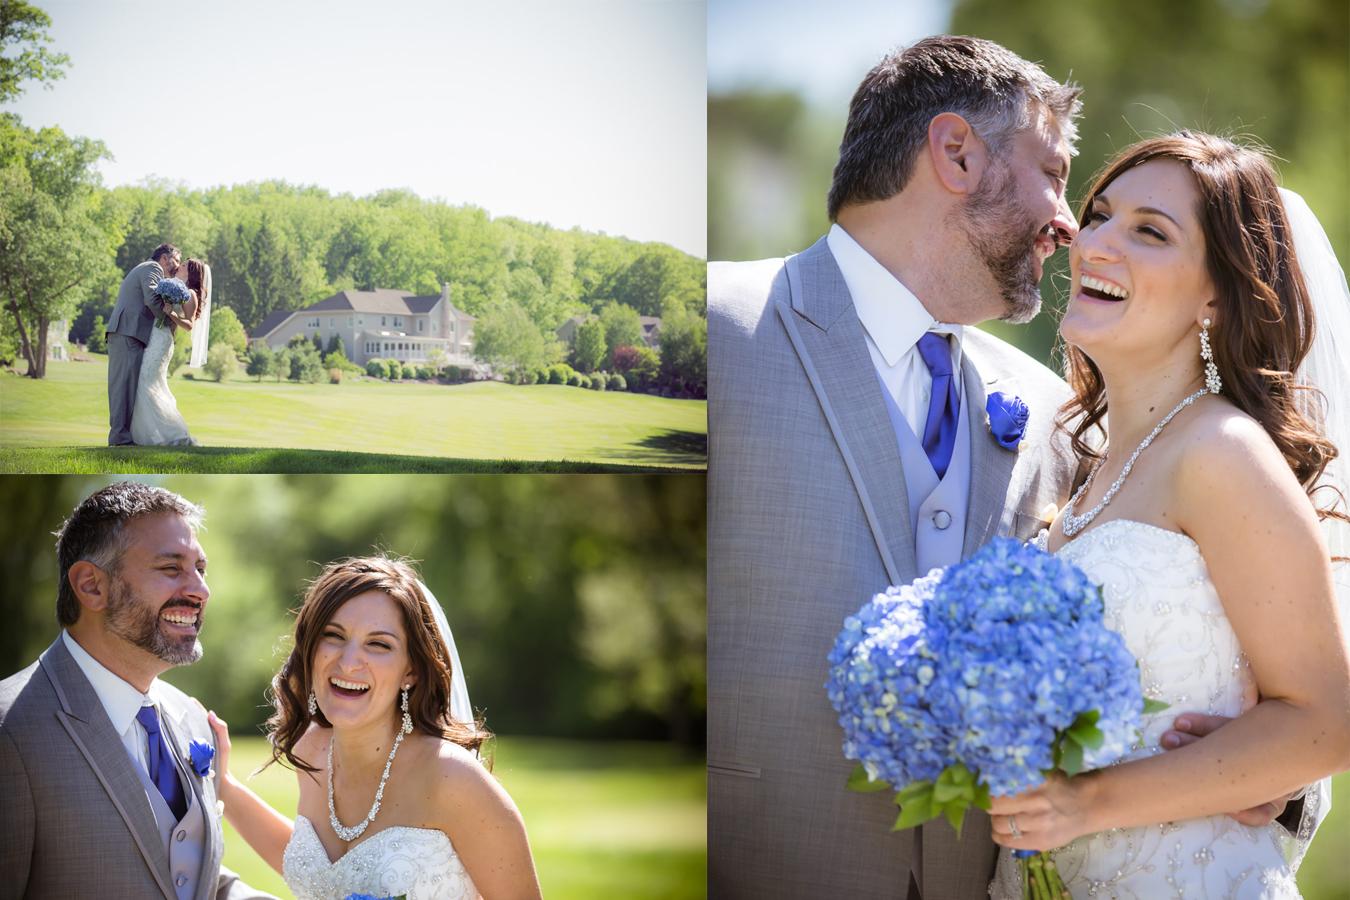 NEPA_Pocono_Weddings_Rob_Lettieri_Photography_08.jpg